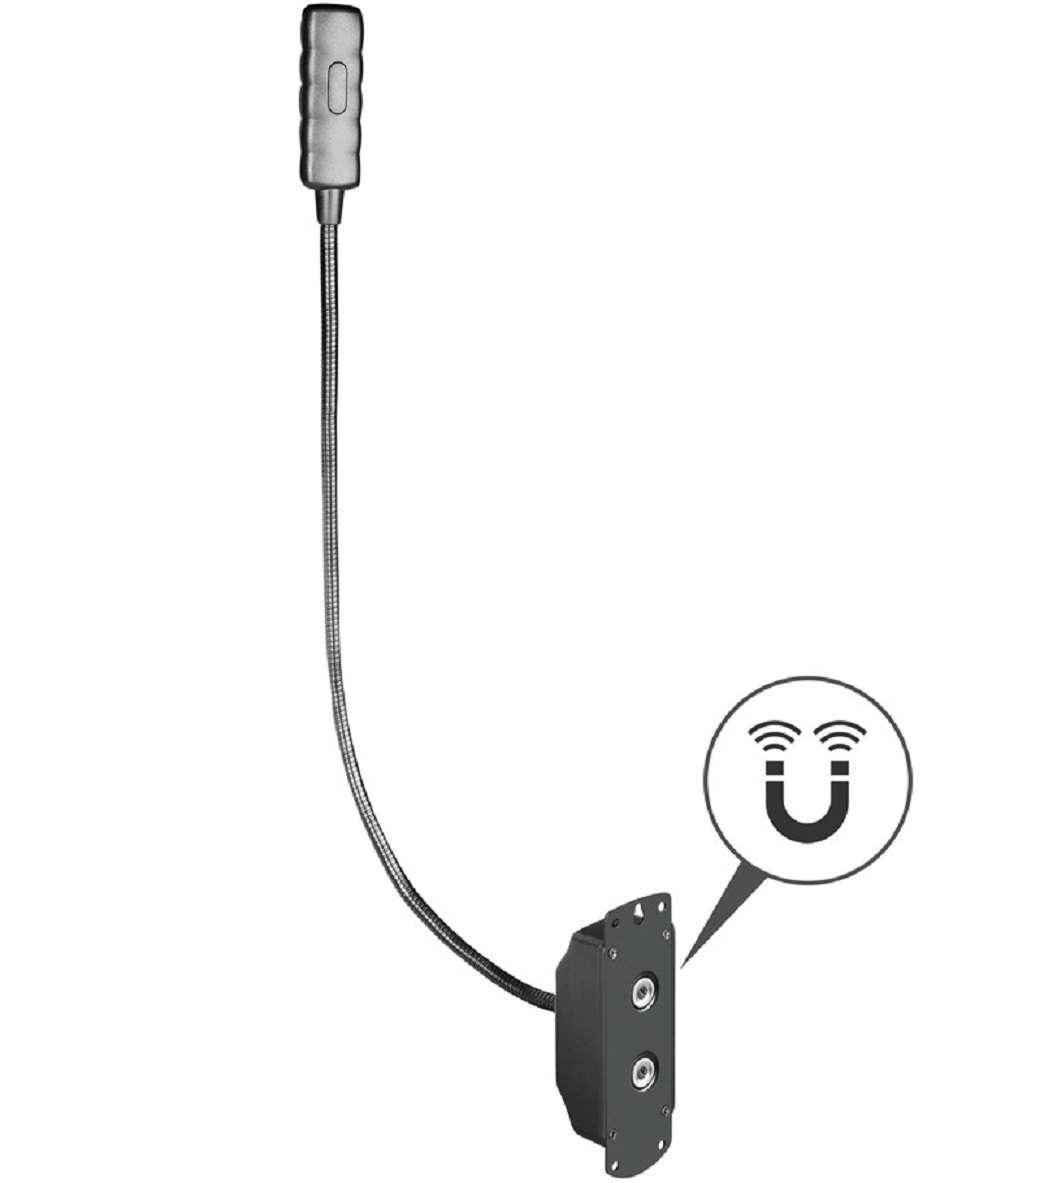 Sockel /& Trafo Fexilight Minilight 2x Ultrahelle Schwanenhalslampe 4 x COB LED